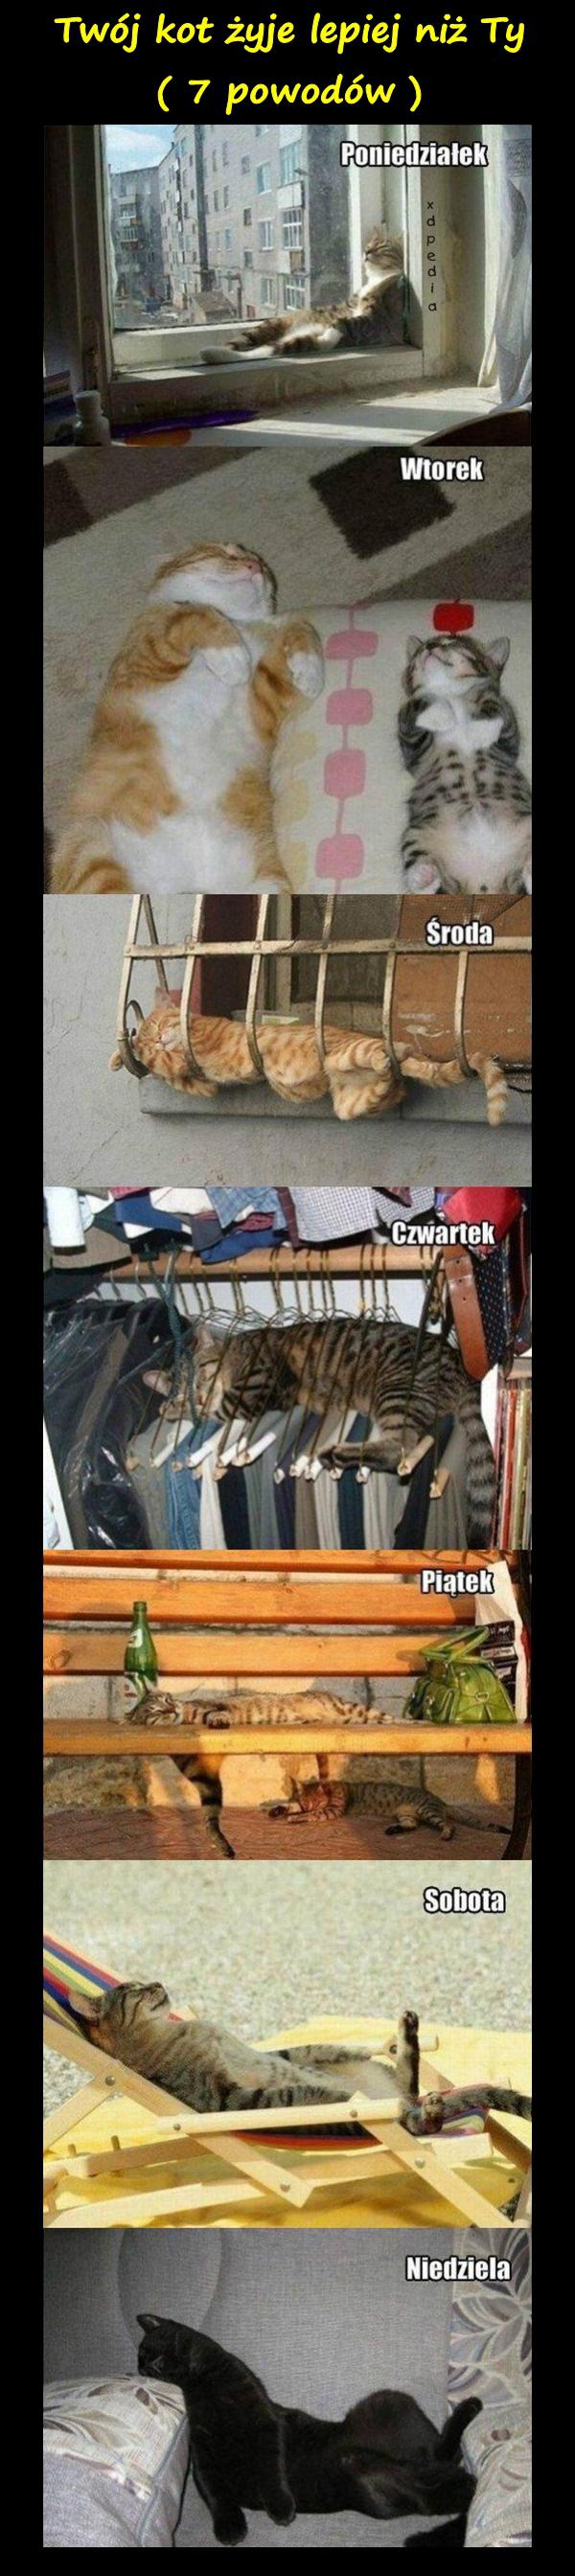 Mem Humor Memy Koty Besty Kotki śmieszne Obrazki Kwejk